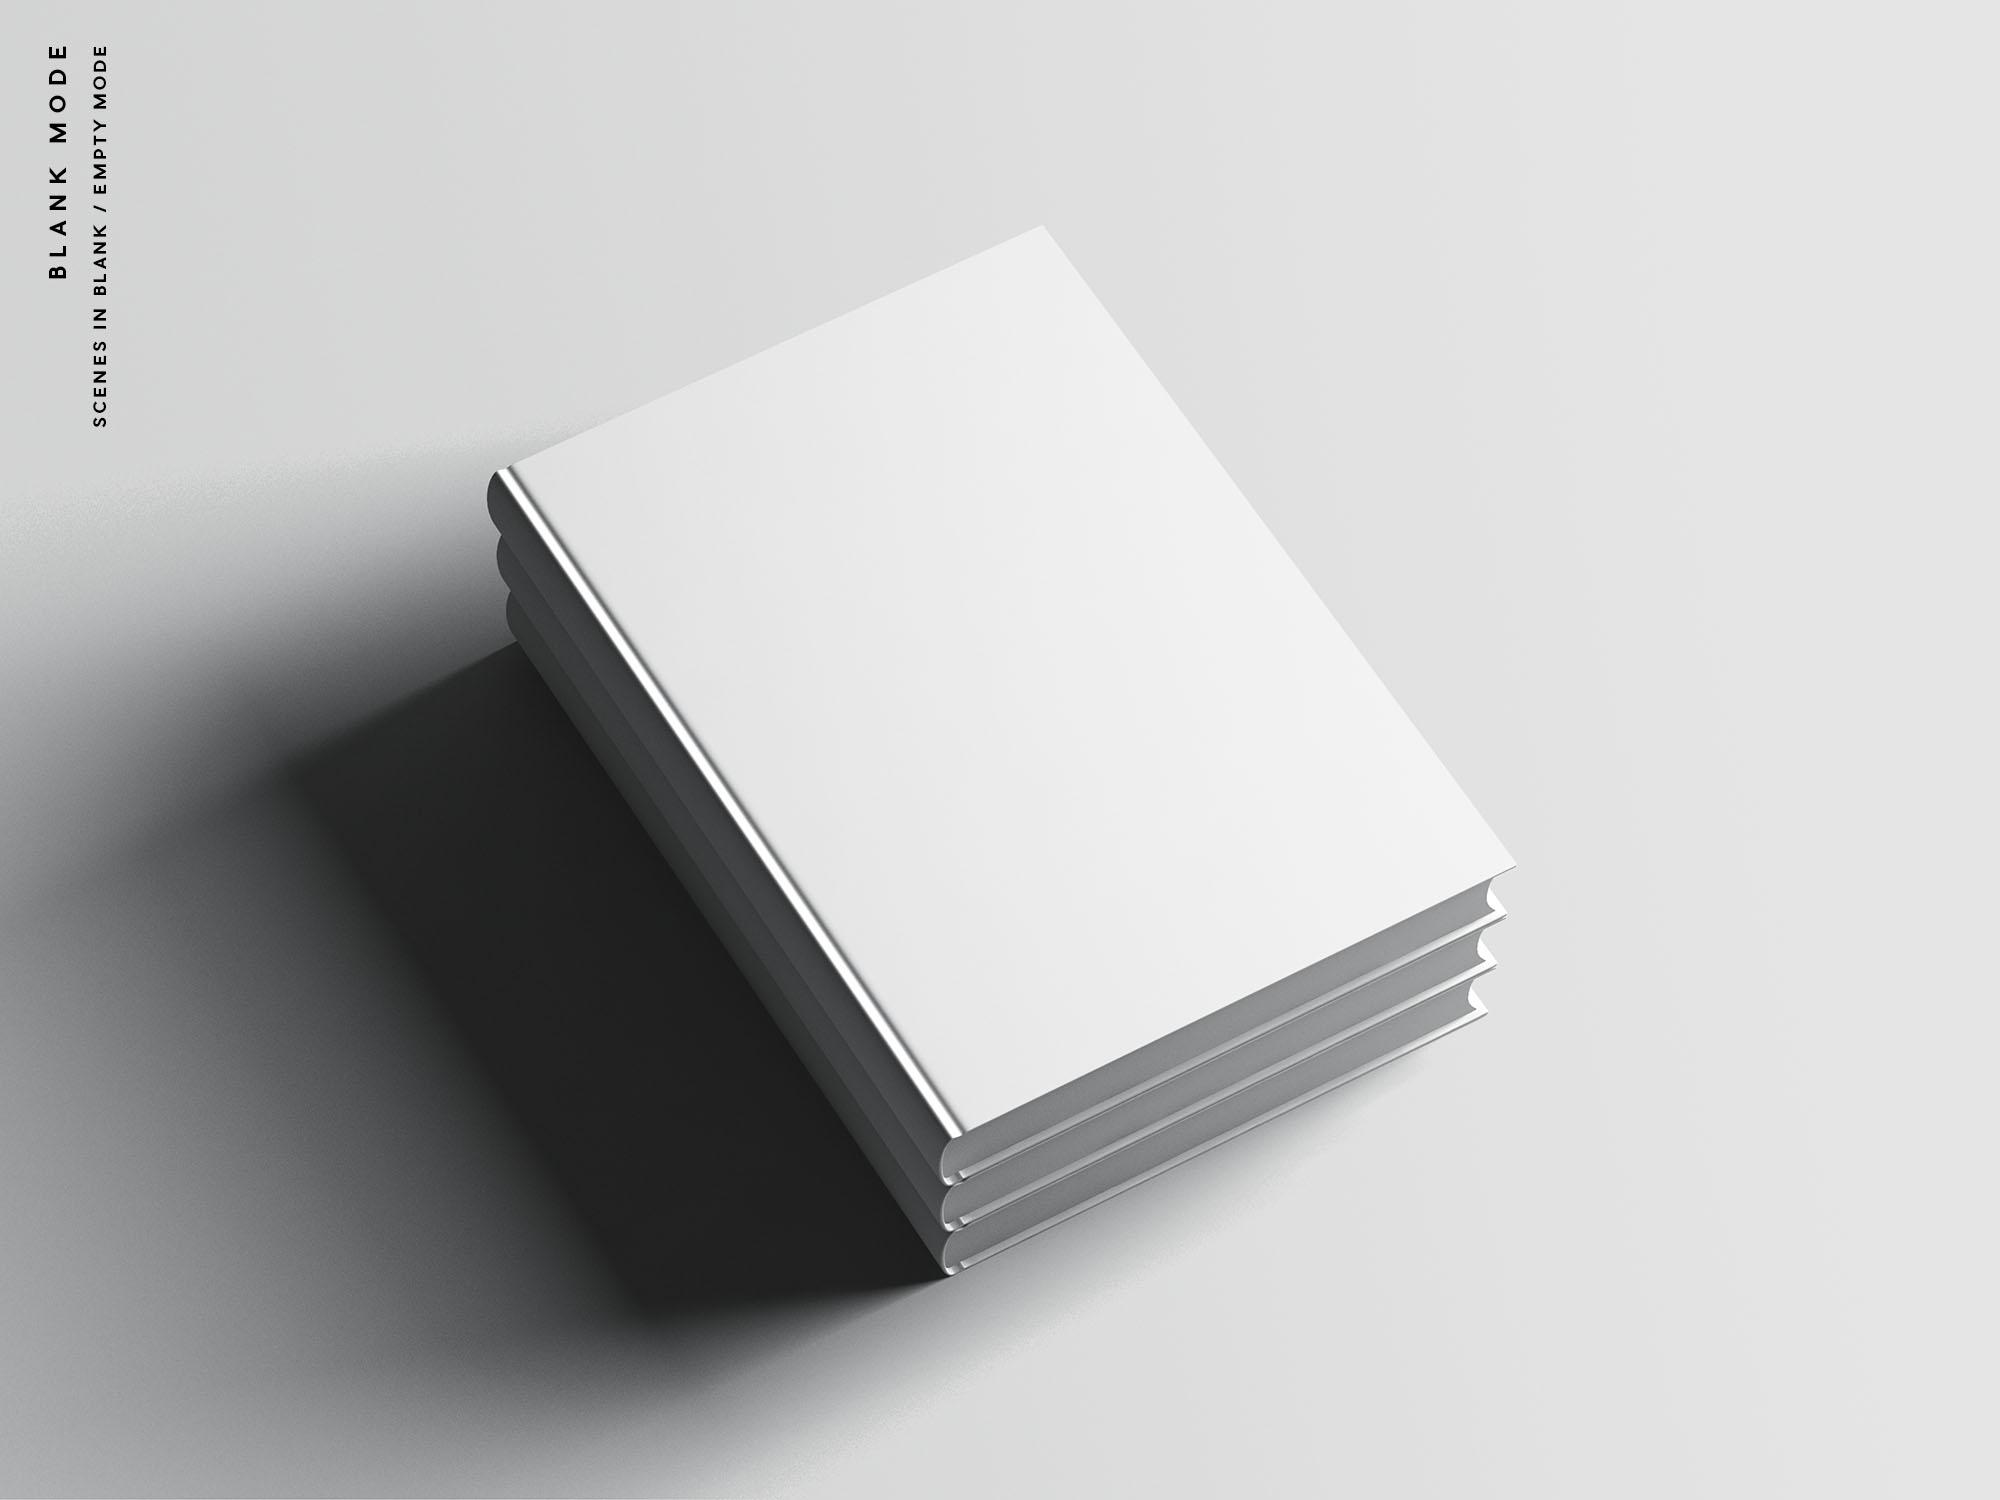 Hardcover A4 Book Mockup Blank Mode